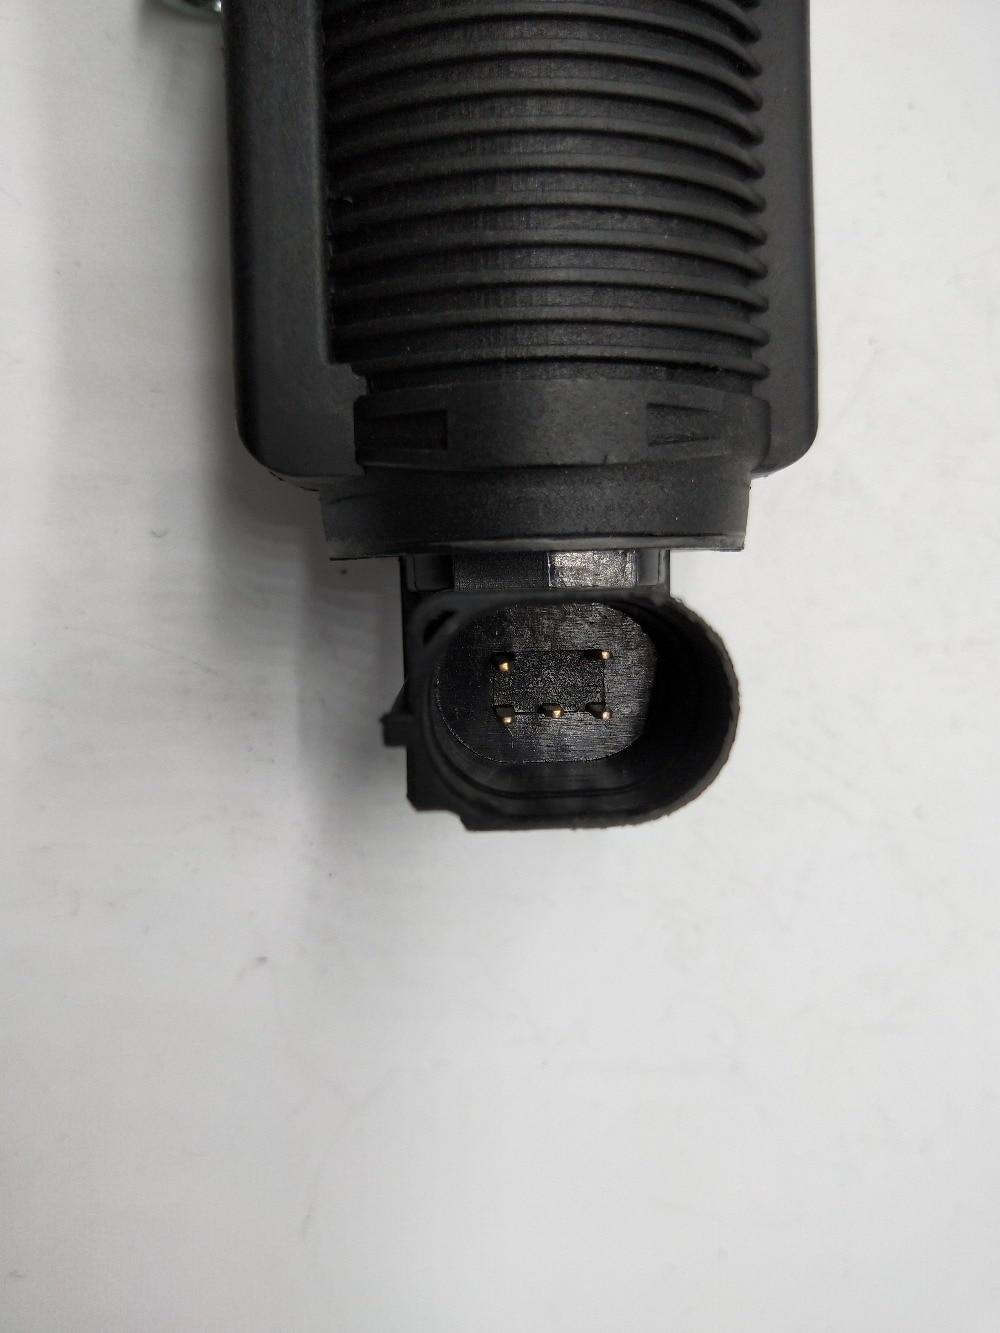 hight resolution of aliexpress com buy egr valve for dacia logan sandero nissan kubistar micra suzuki jimny renault clio grand scenic kangoo megane modus thalia 1 5 from